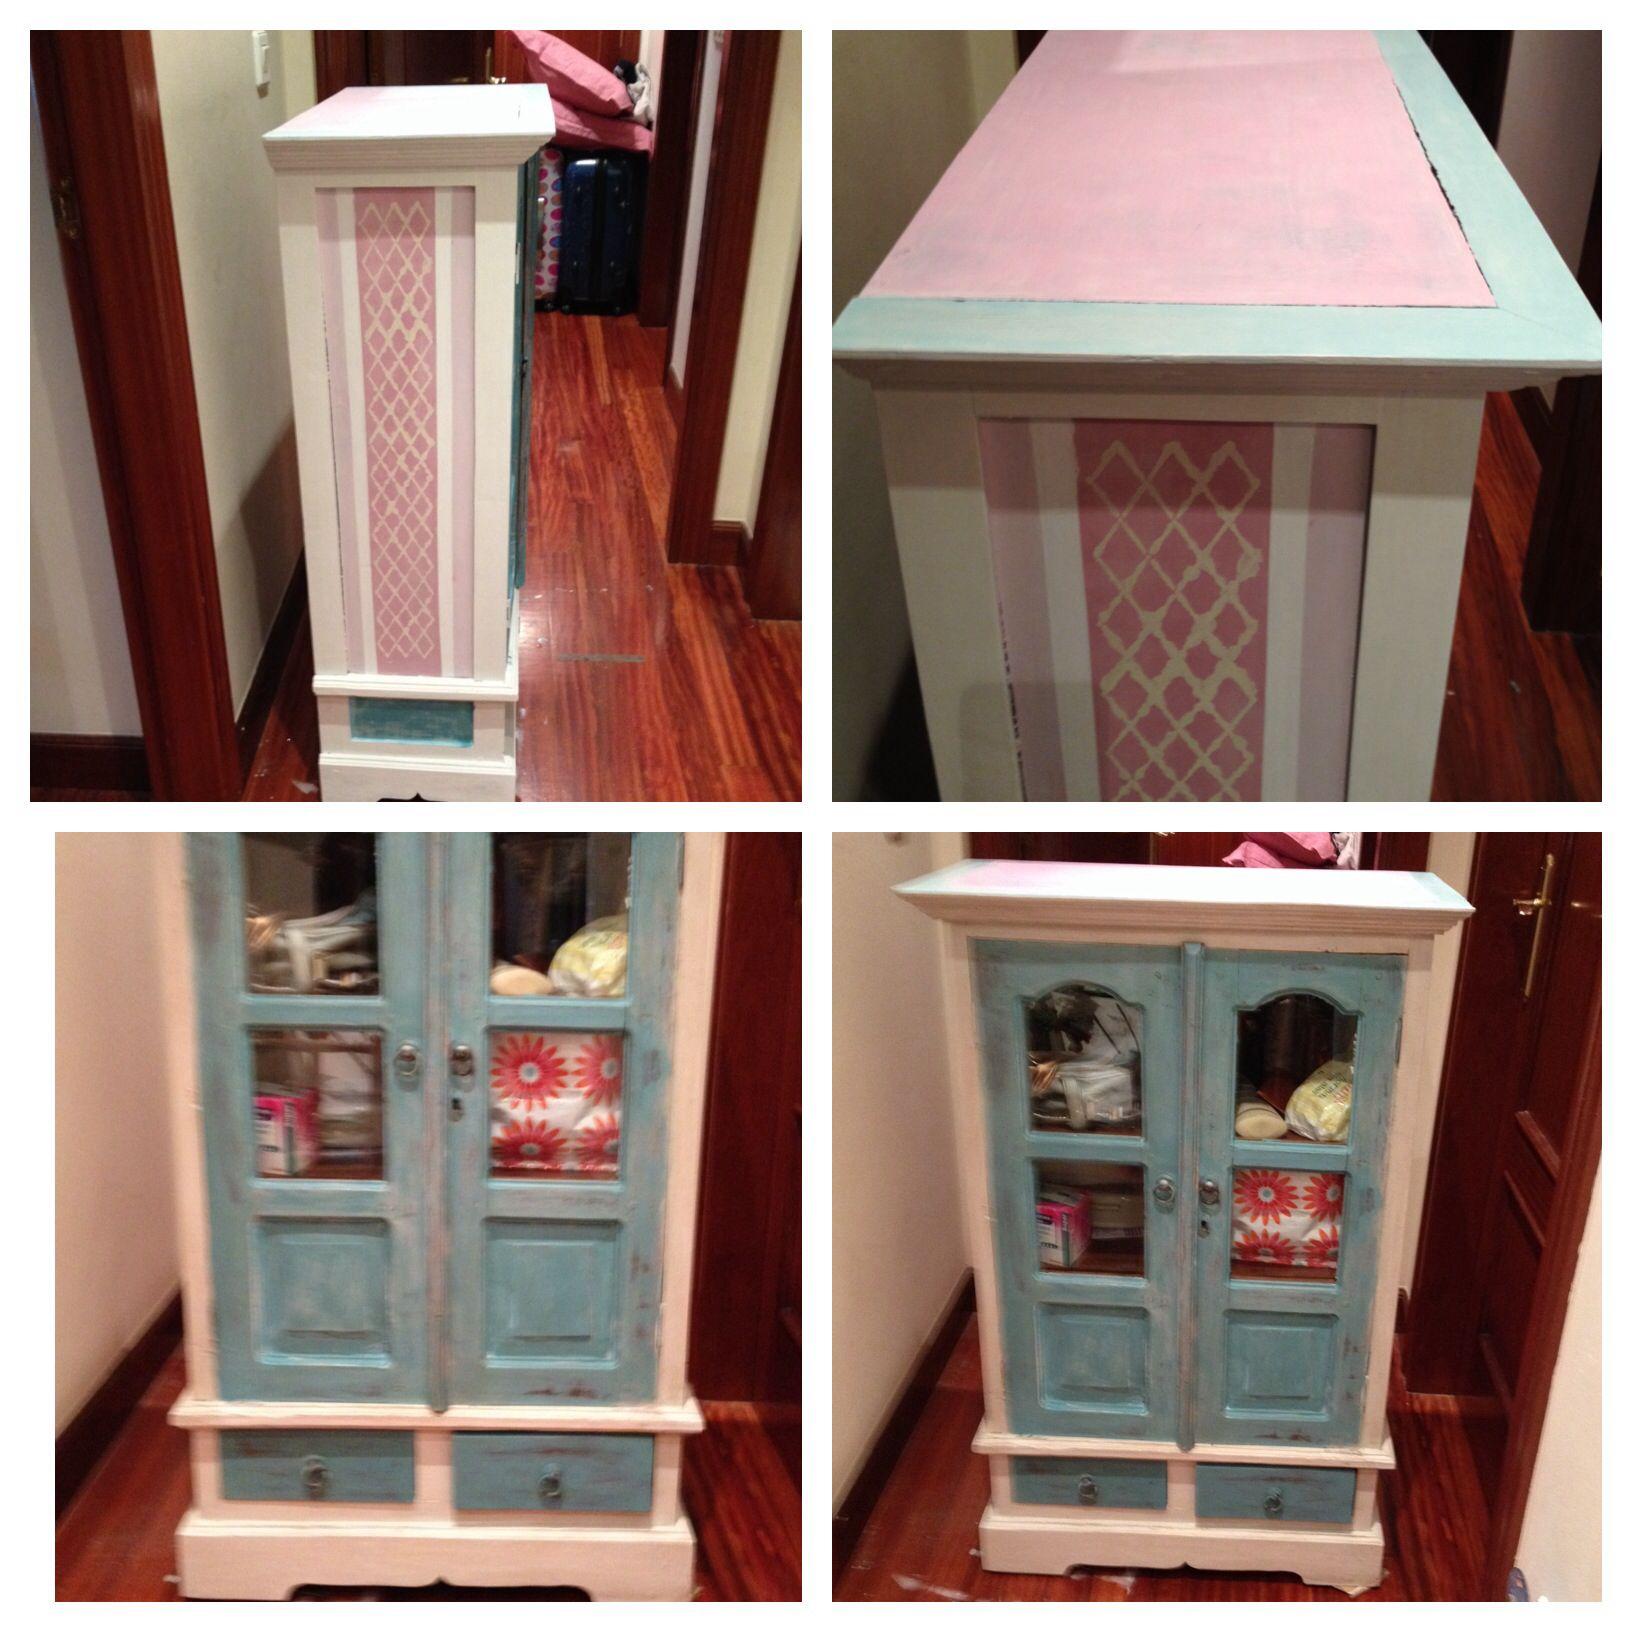 Mueble pintado con chalk paint y encerado muebles - Pintar muebles chalk paint ...